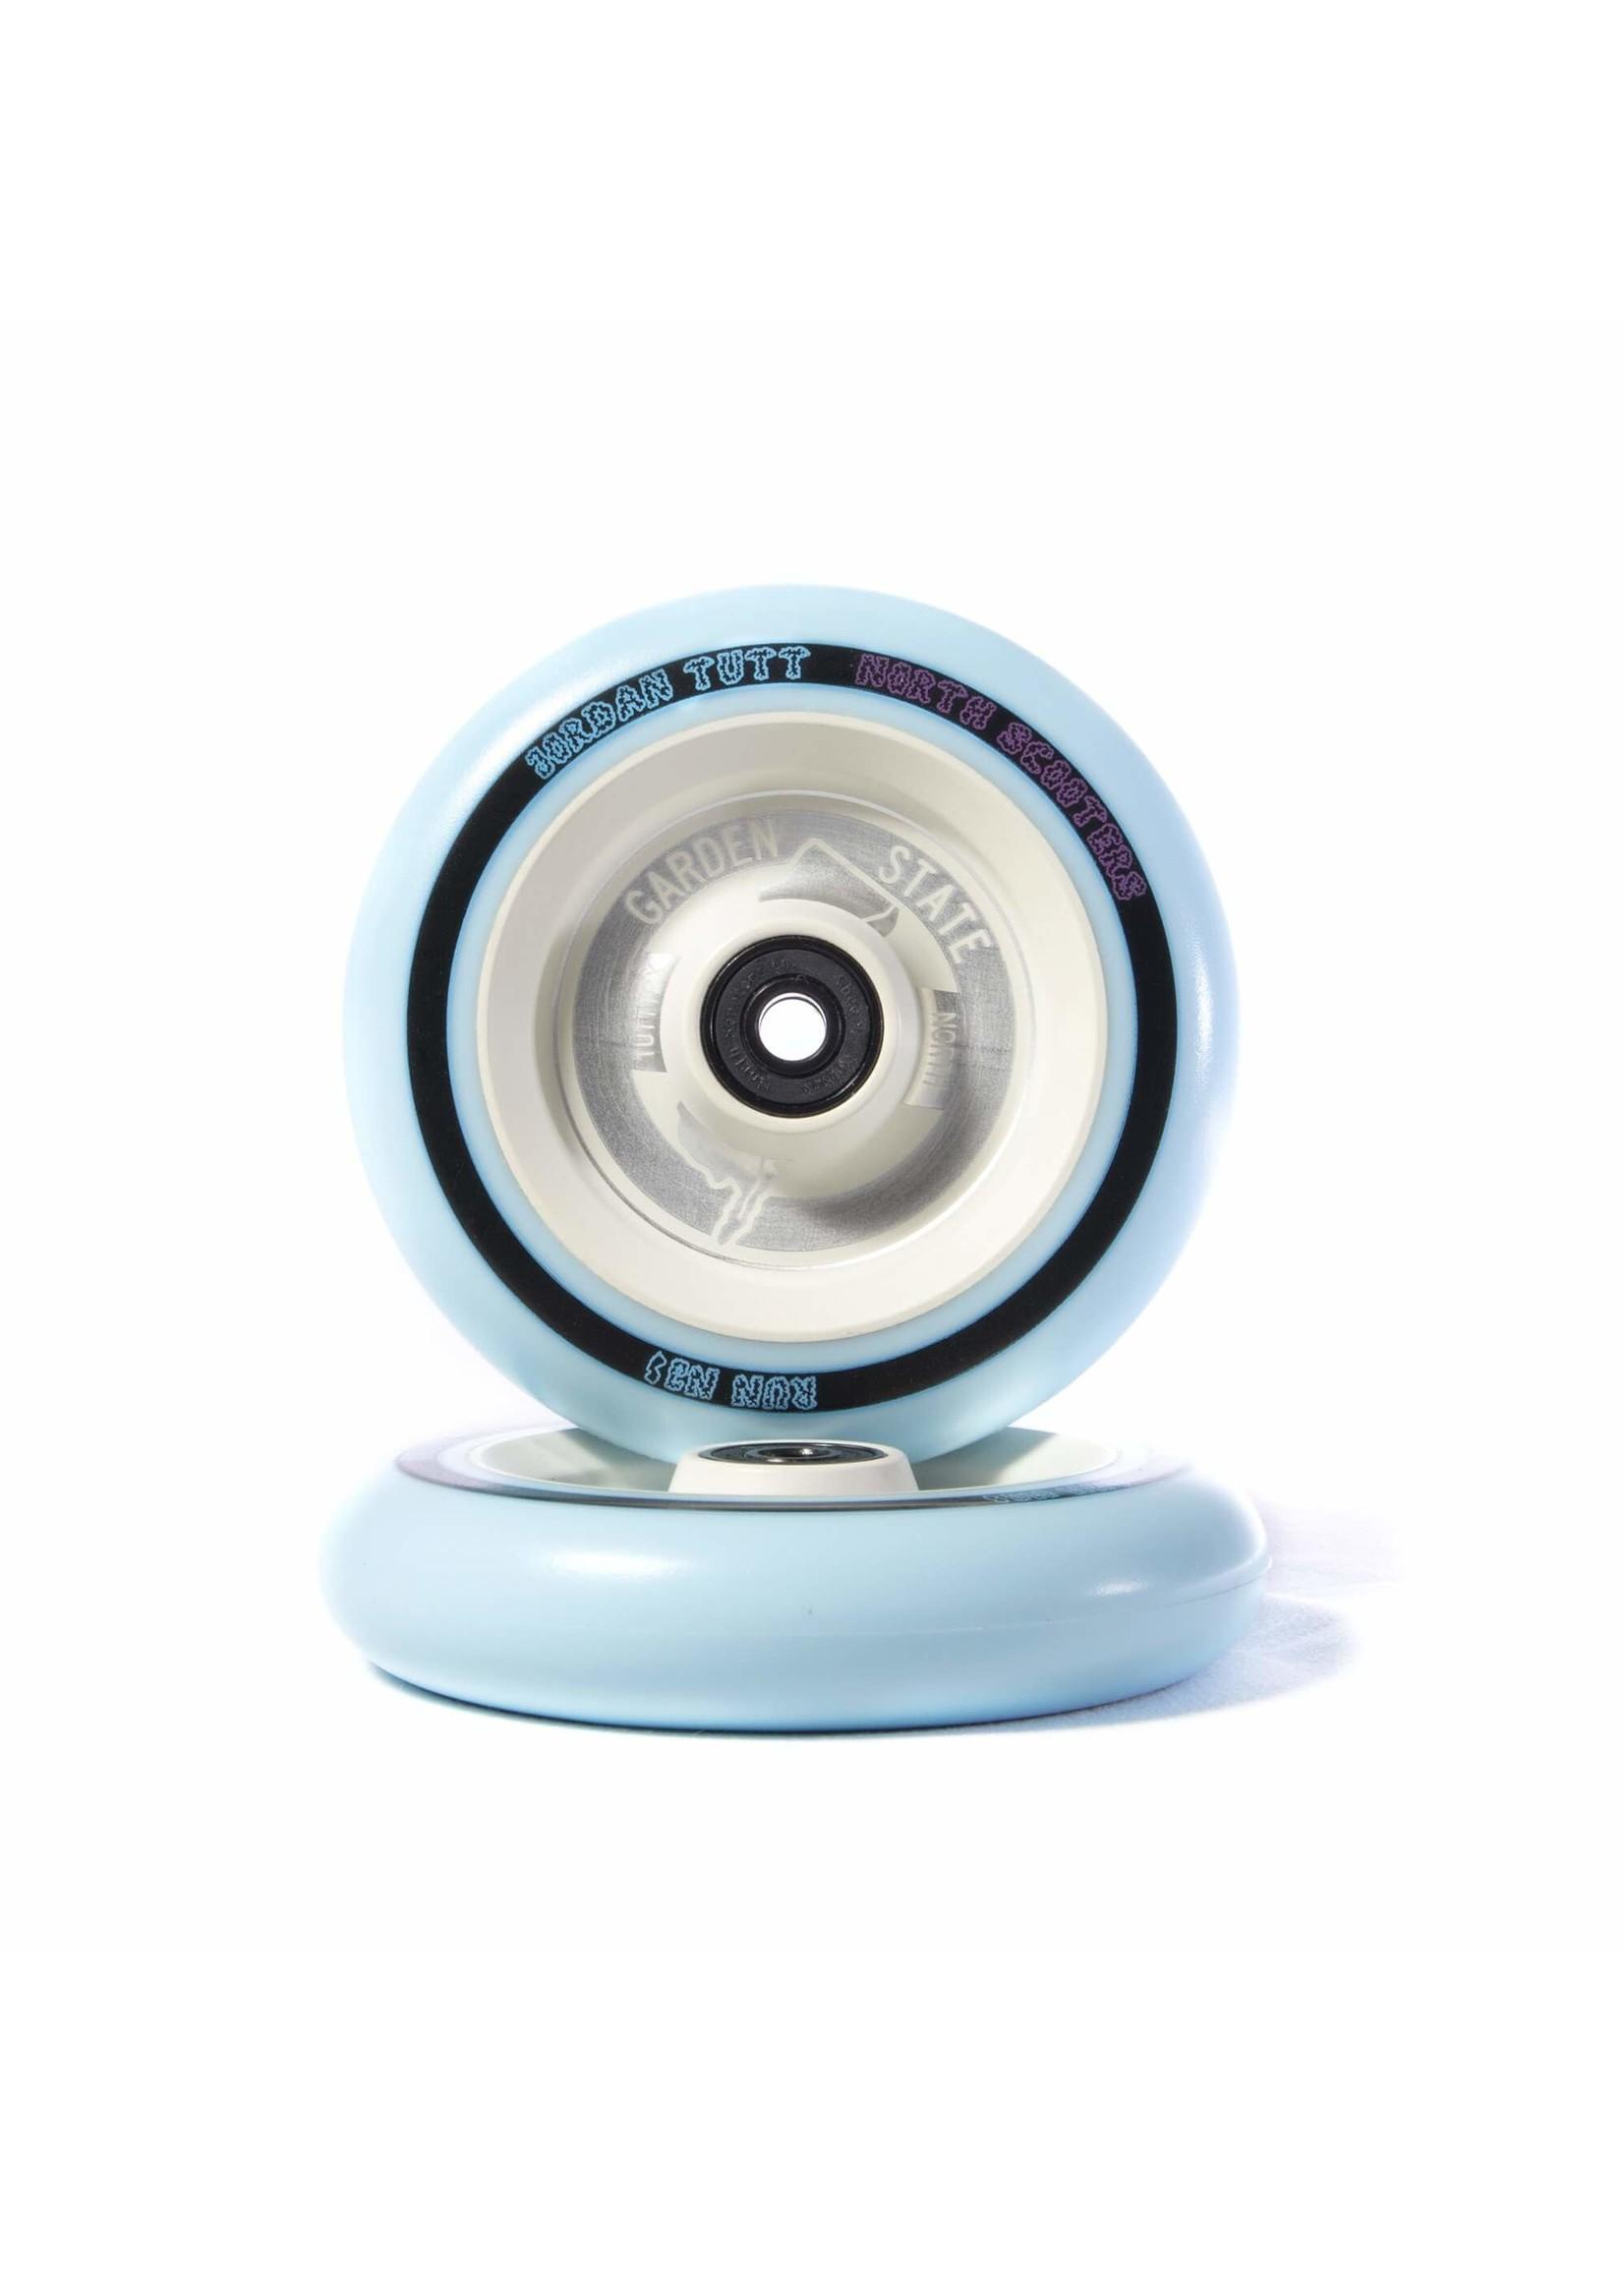 North North - Jordan Tutt Sig Wheel - 115x30mm